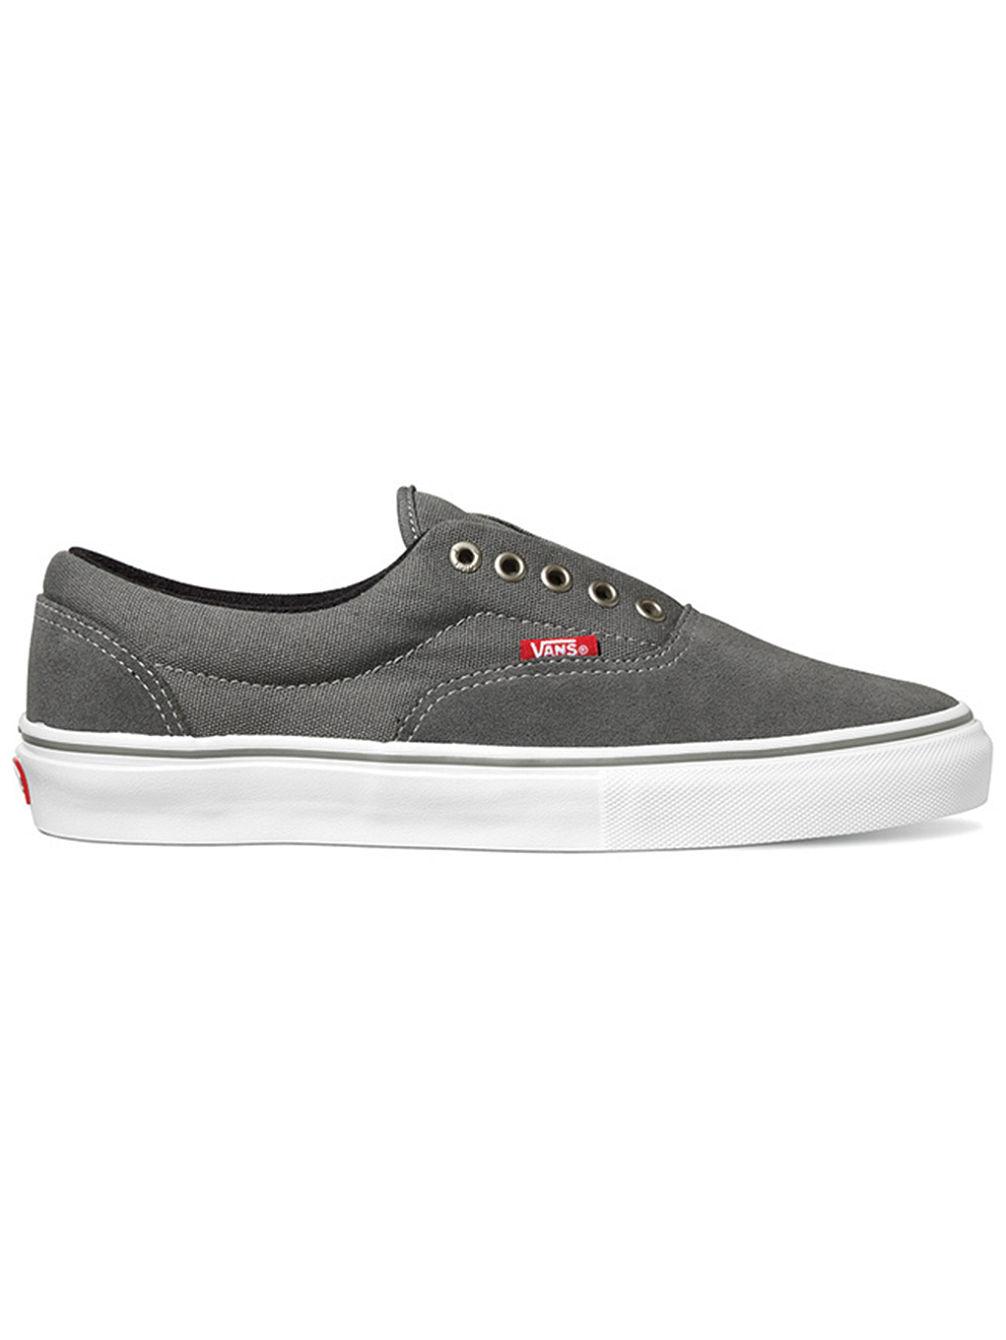 Buy Vans Era Laceless Pro Skate Shoes online at blue-tomato.com bec4c02ed